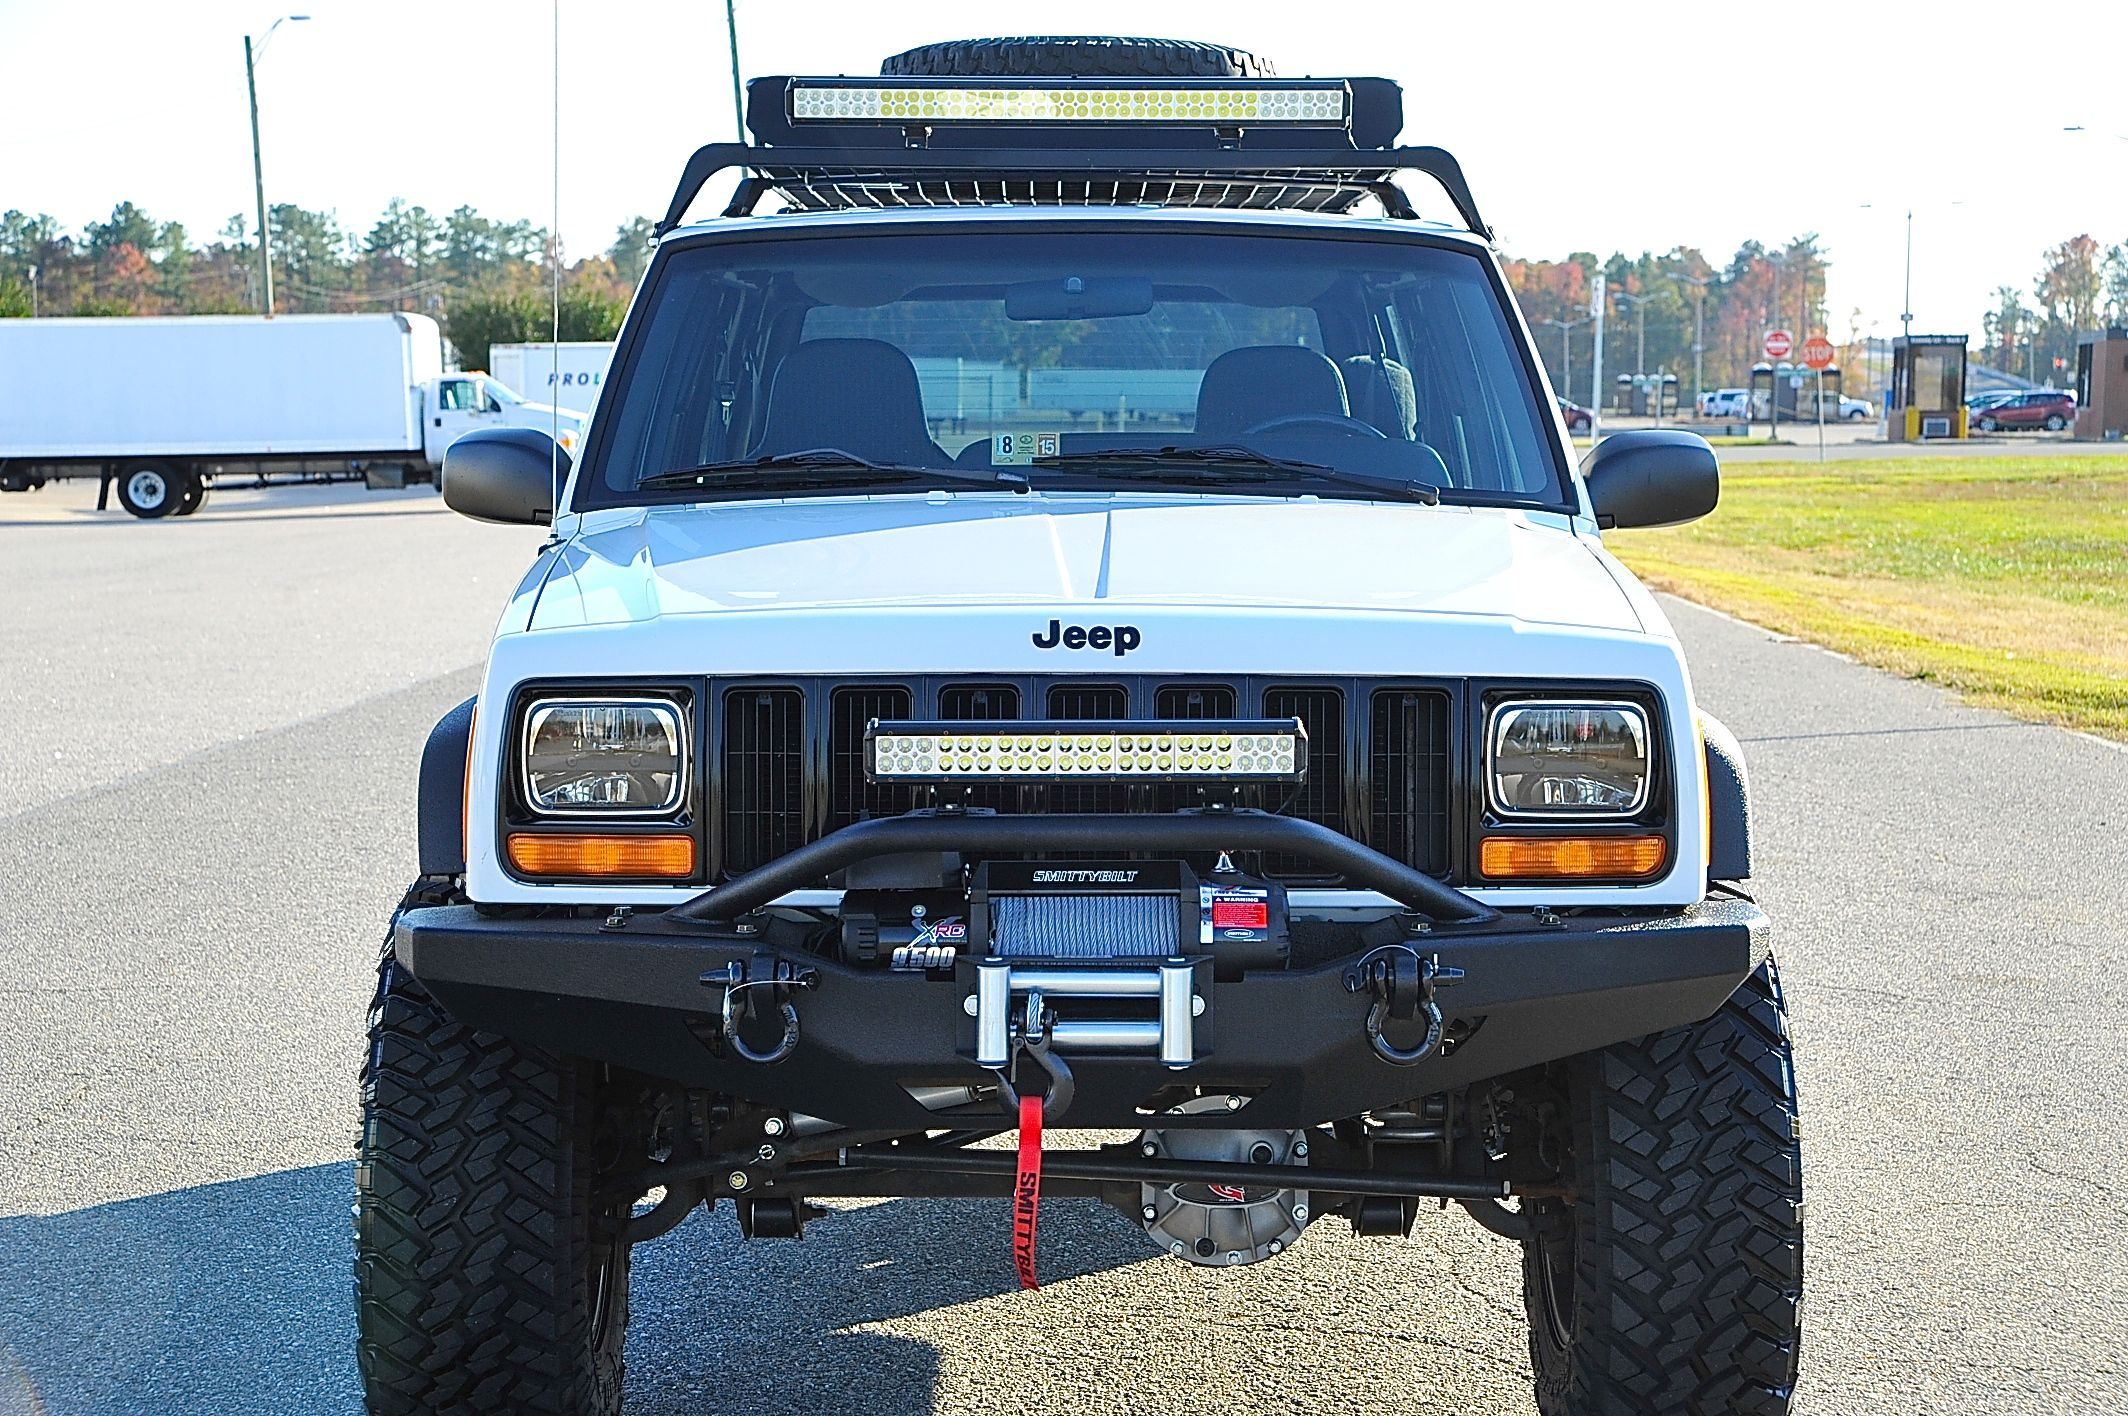 Xj Jeep 50 Inch 23 Inch Led Light Bar On The Jeep Xj Jeep Cherokee Jeep Xj Jeep Cherokee Xj